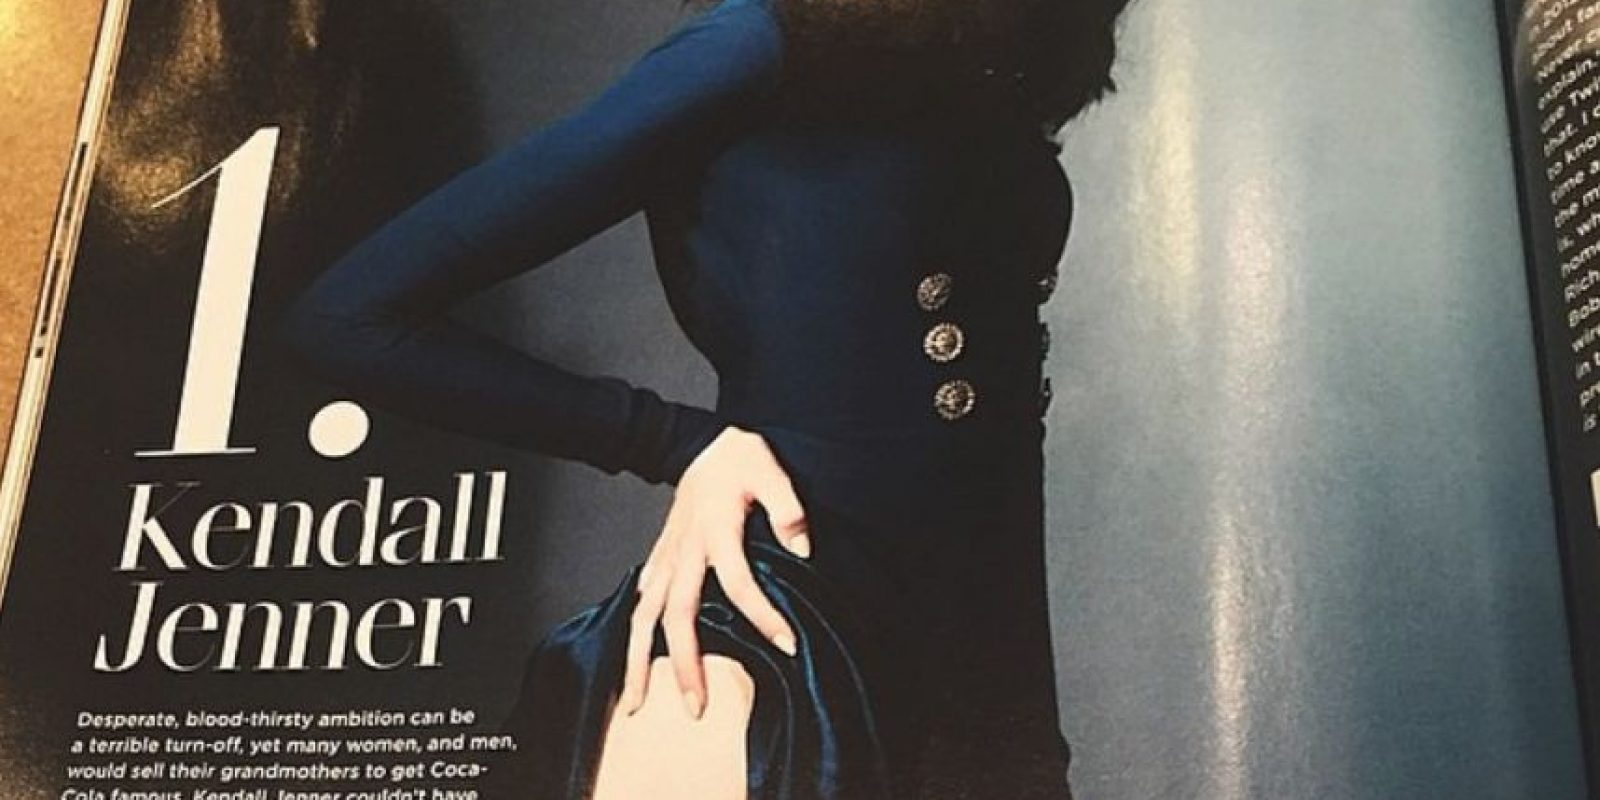 Es el rostro de Estee Lauder. Foto:Kendall Jenner/Instagram